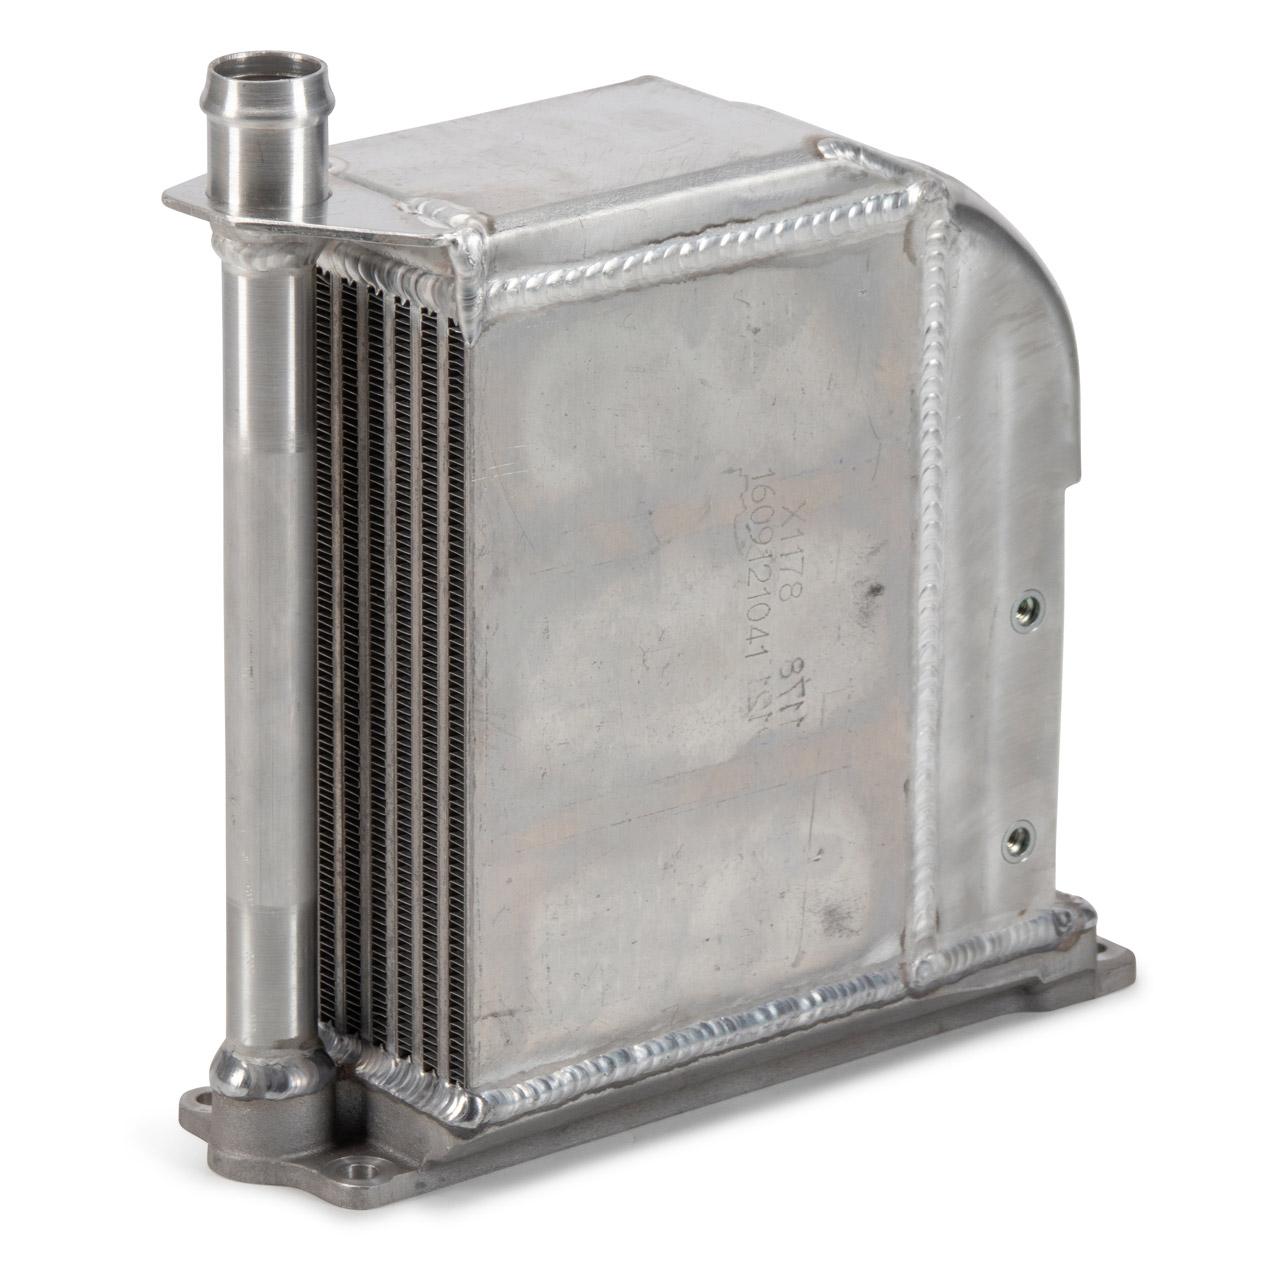 Ölkühler Motorölkühler Kühler für PORSCHE 911 2.2-3.3 1969-1989 91110704102